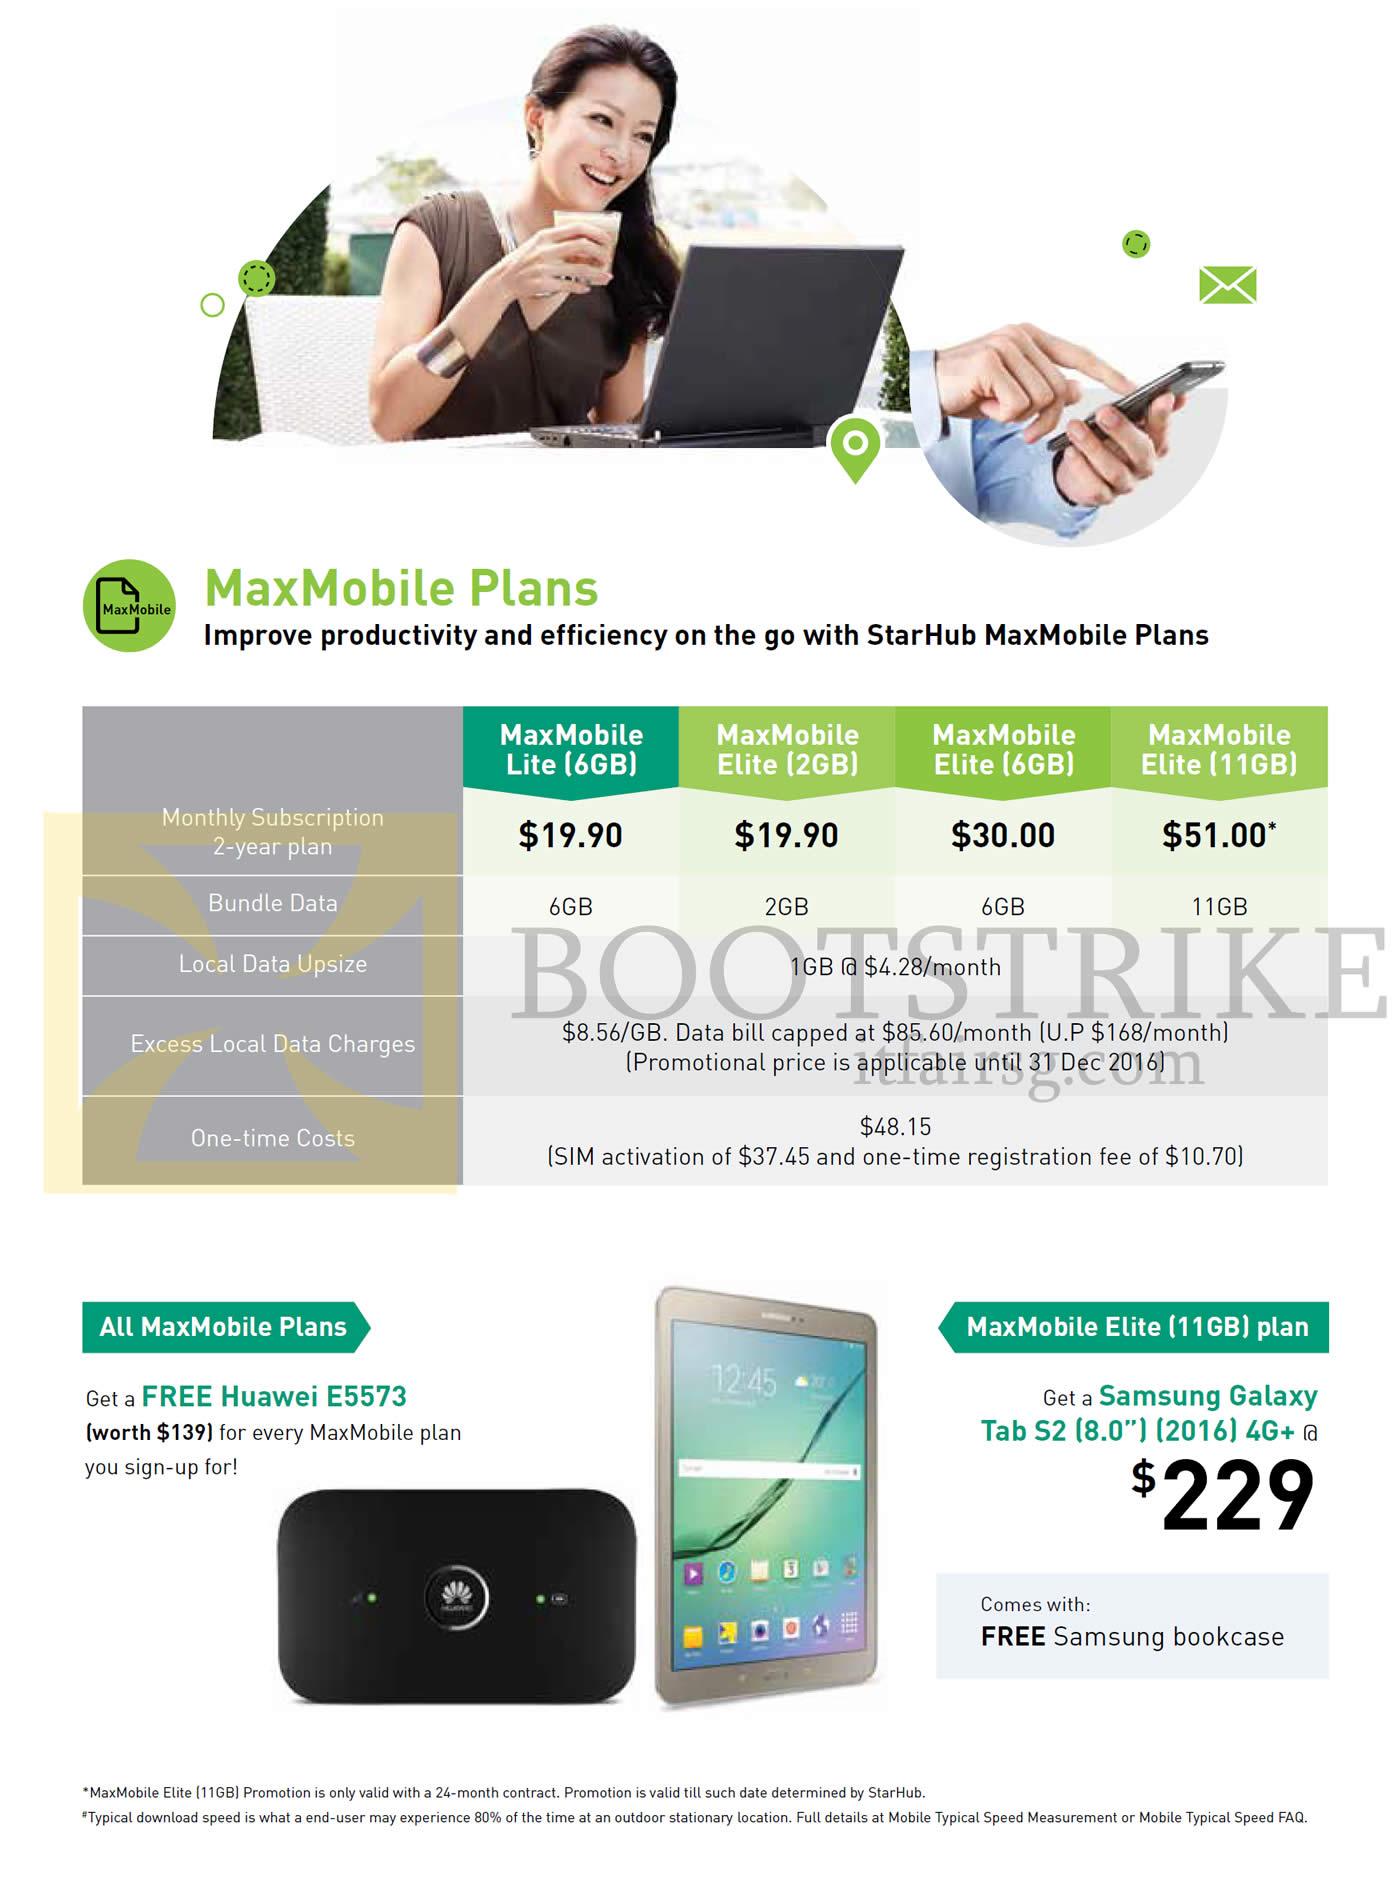 COMEX 2016 price list image brochure of StarHub Business MaxMobile Plans MaxMobile Lite, Elite, 2GB, 6GB, 11GB, All MaxMobile Plans, MaxMobile Elite Plan